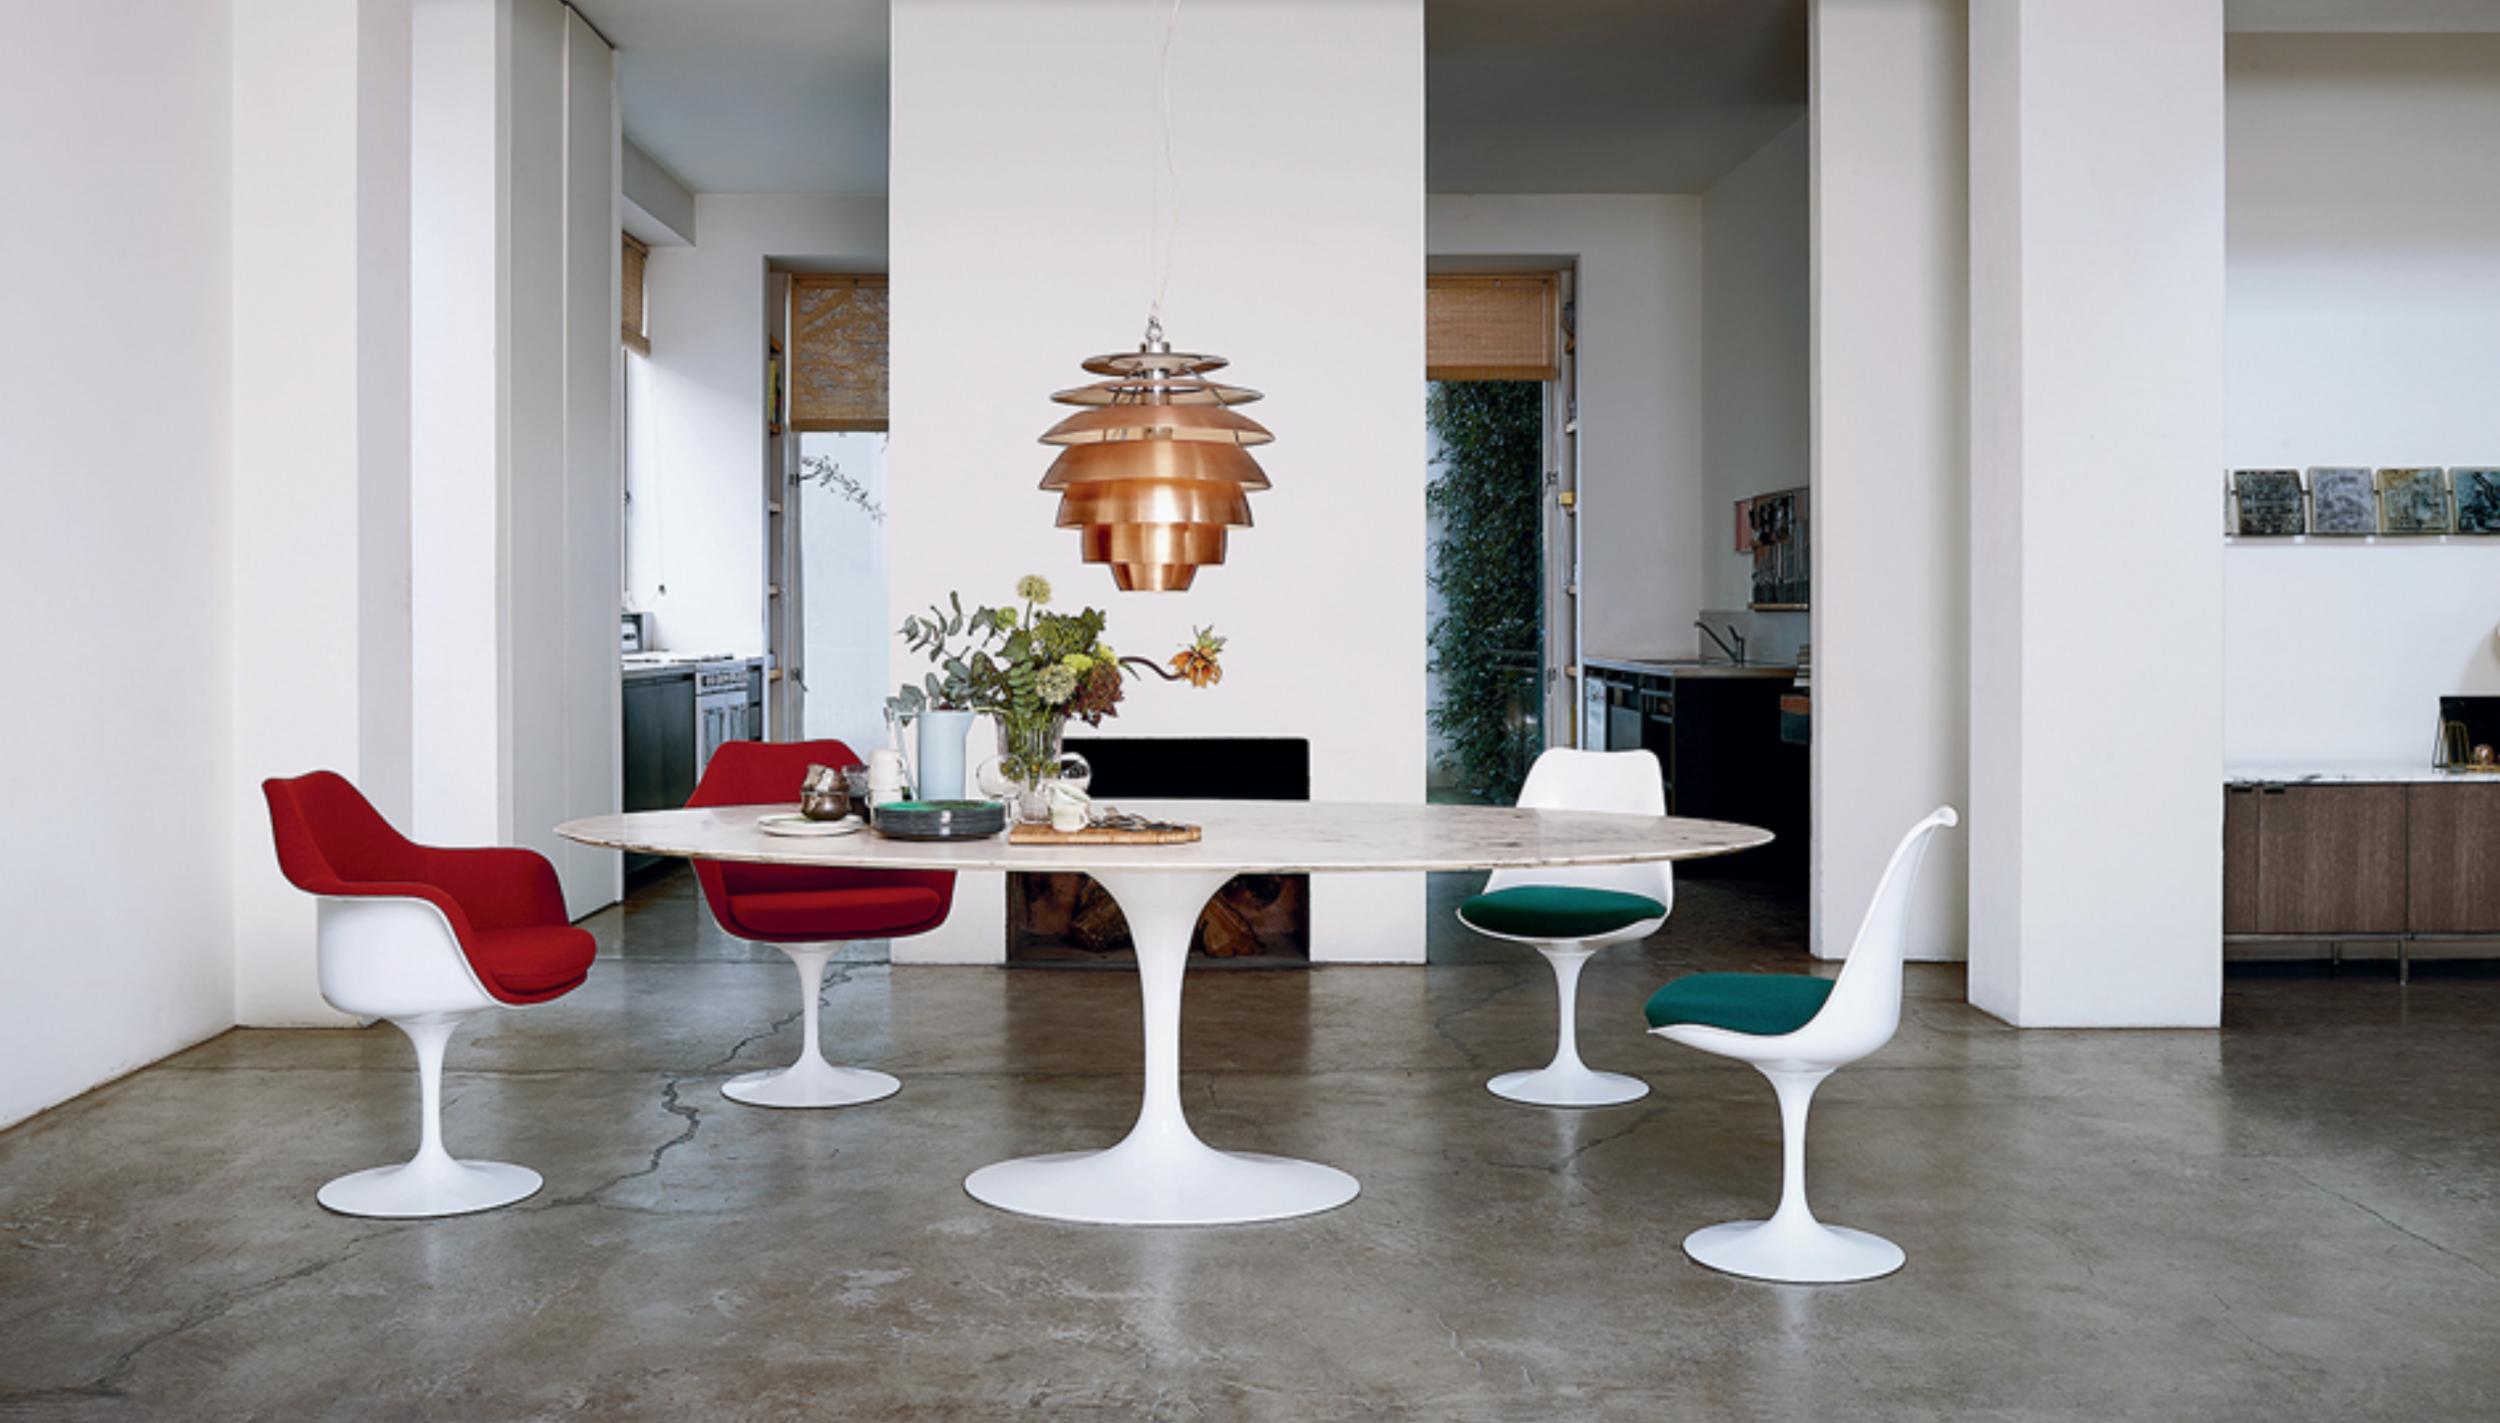 Knoll Promo Saarinen stoel tulip halingdale Loncin designmeubelwinkel interieur interieurwinkel Leuven Hasselt Brussels Bruxelles Mechelen Antwerpen Gent Knokke.png